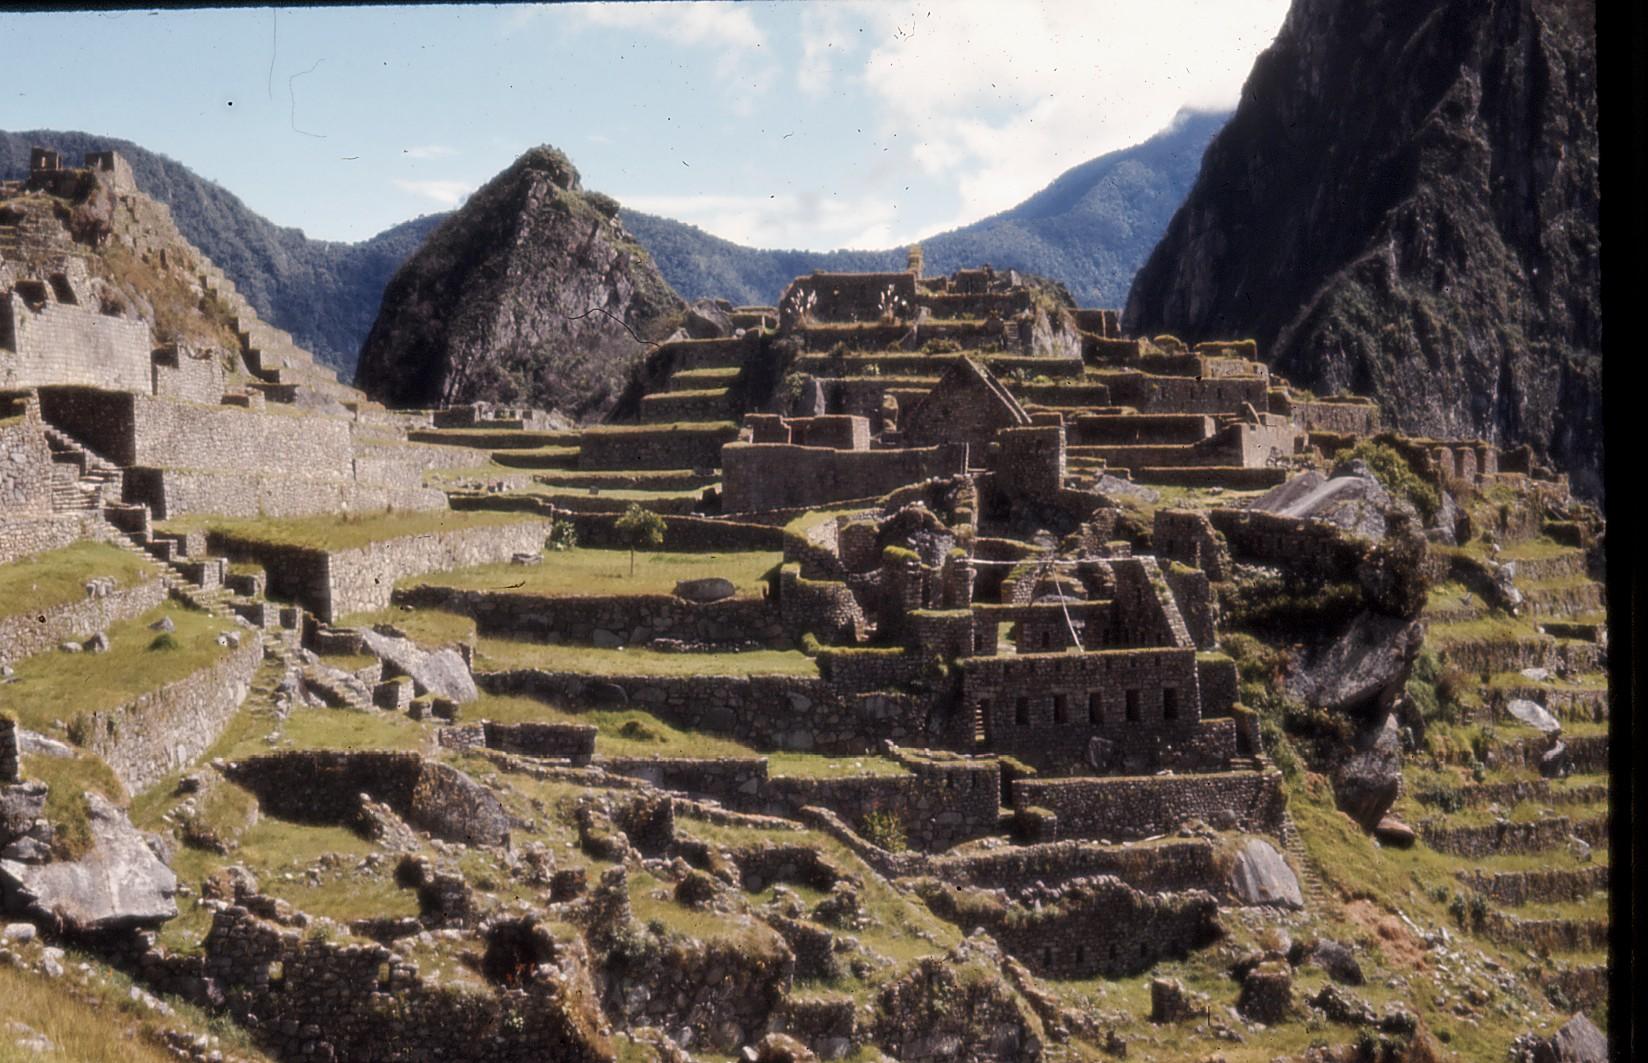 southamerica1972-15